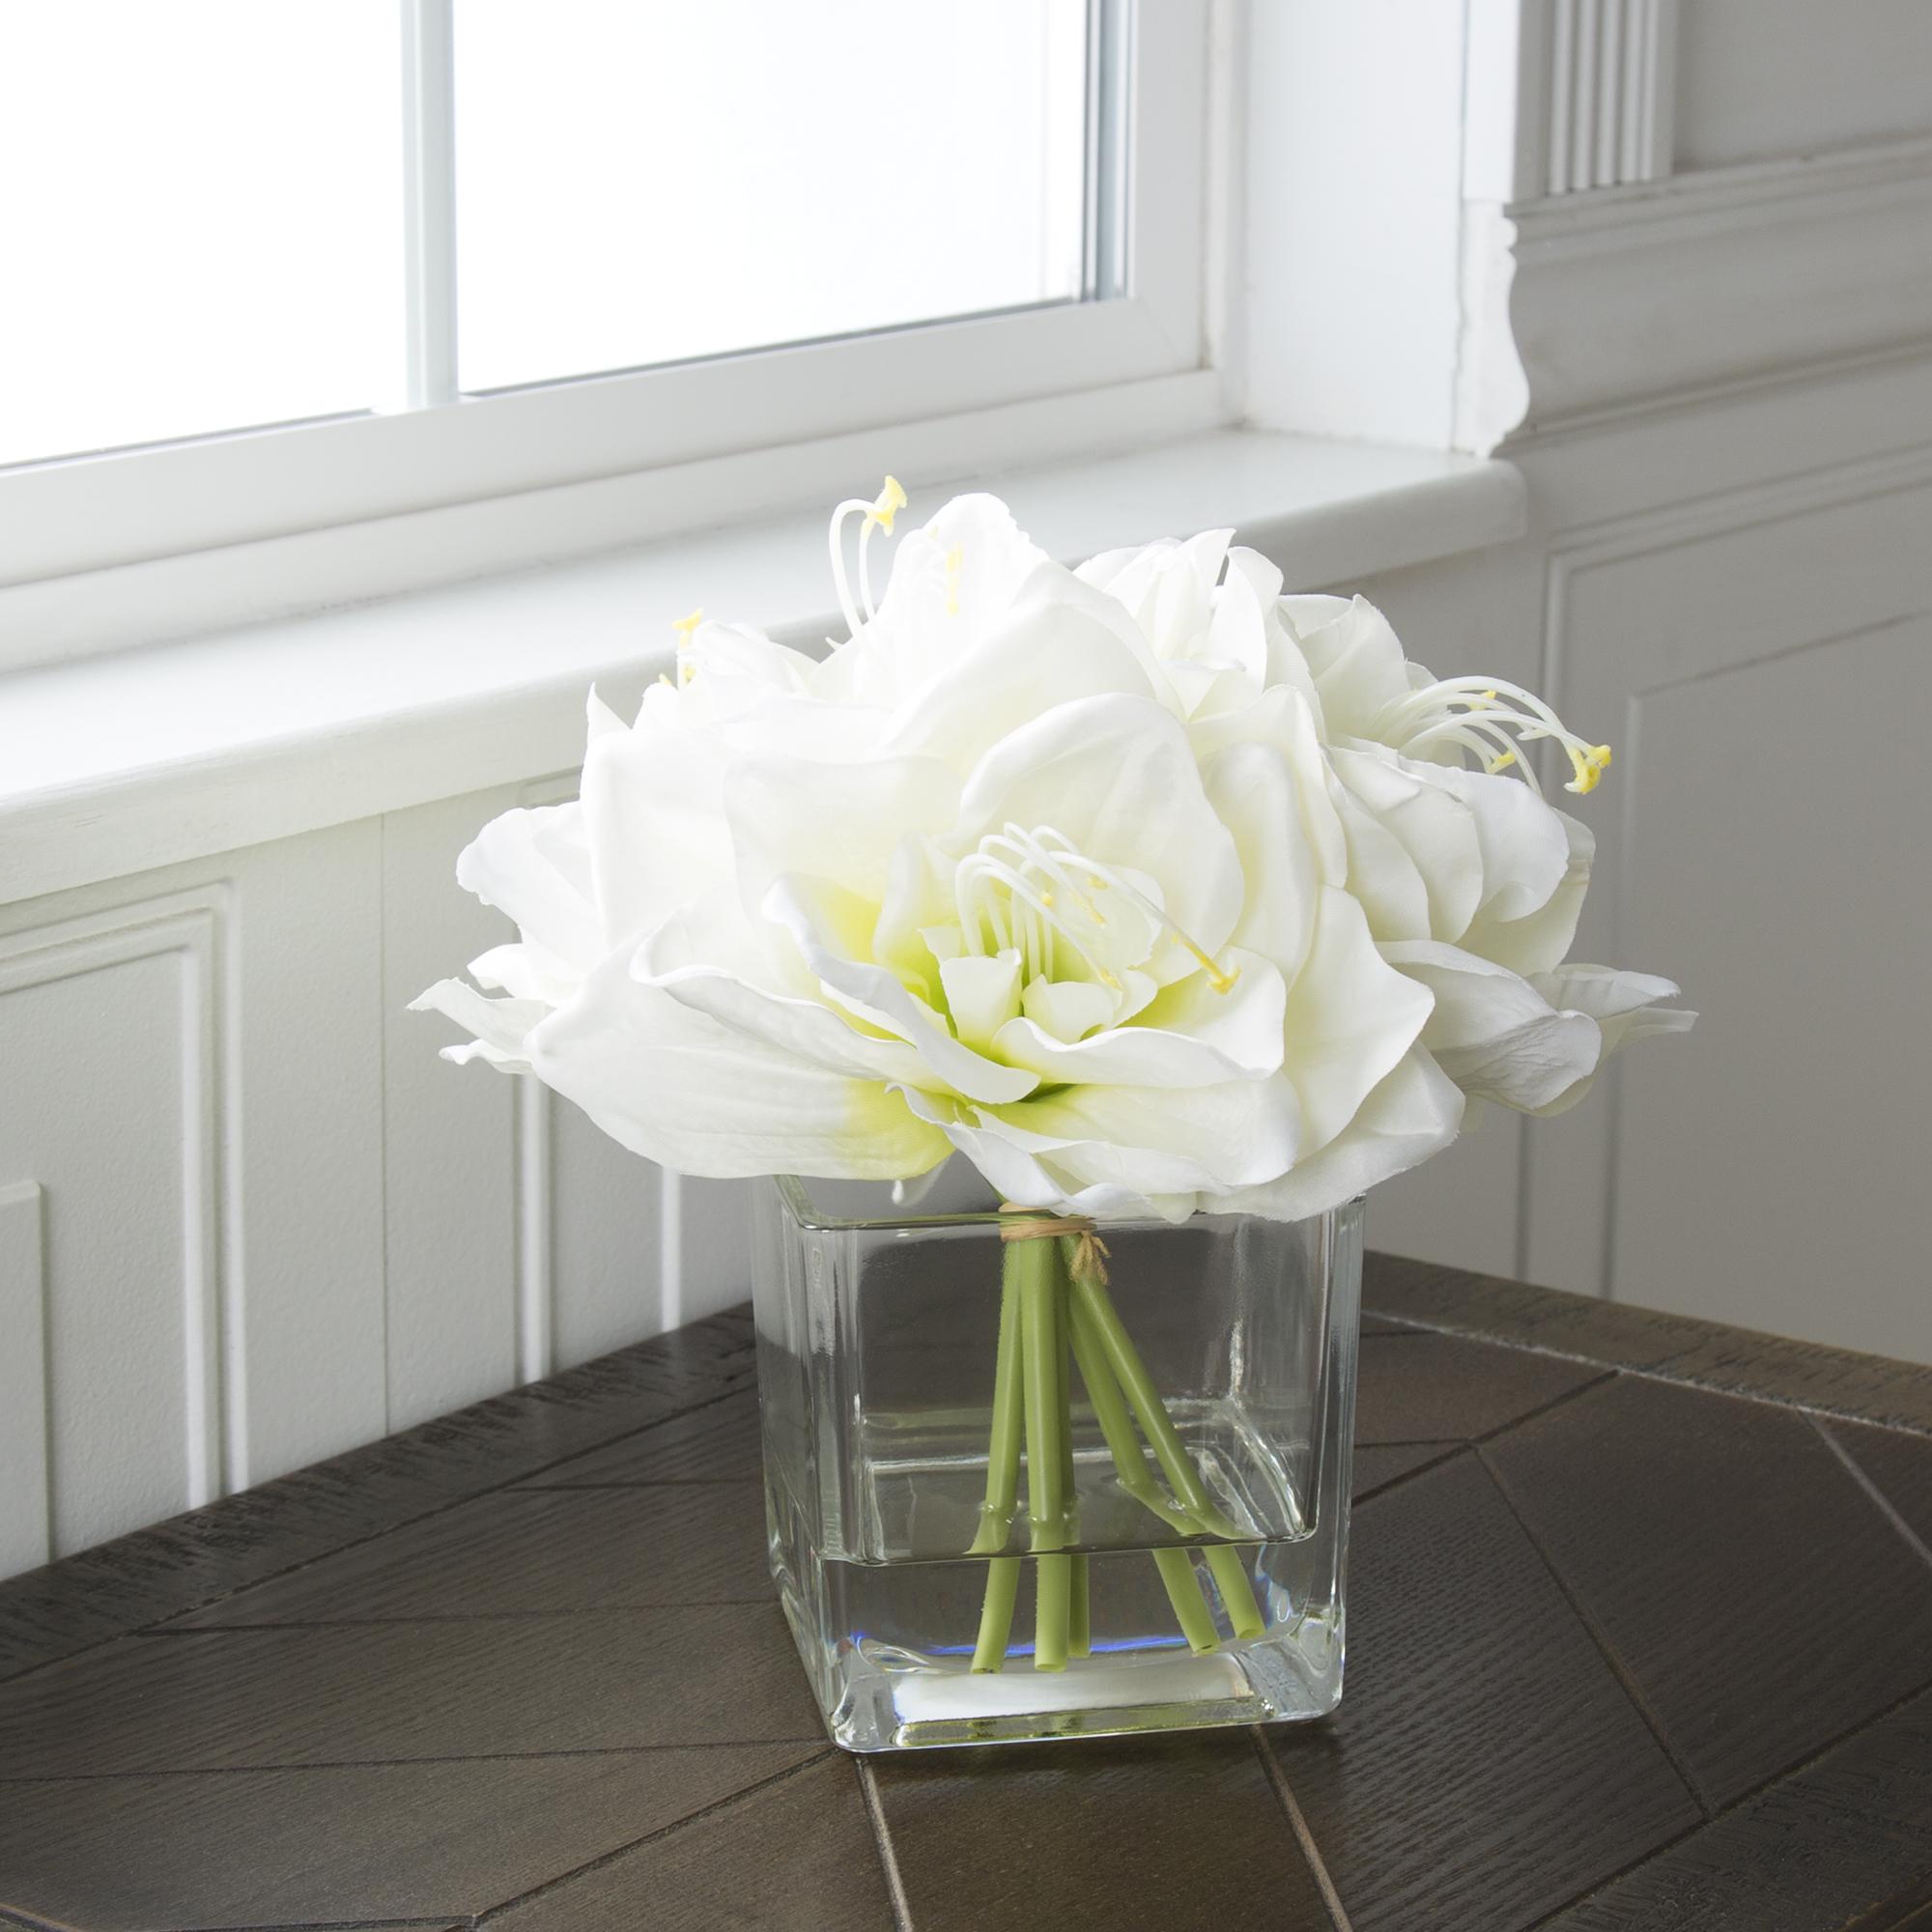 Garden Lilies in Glass Vase